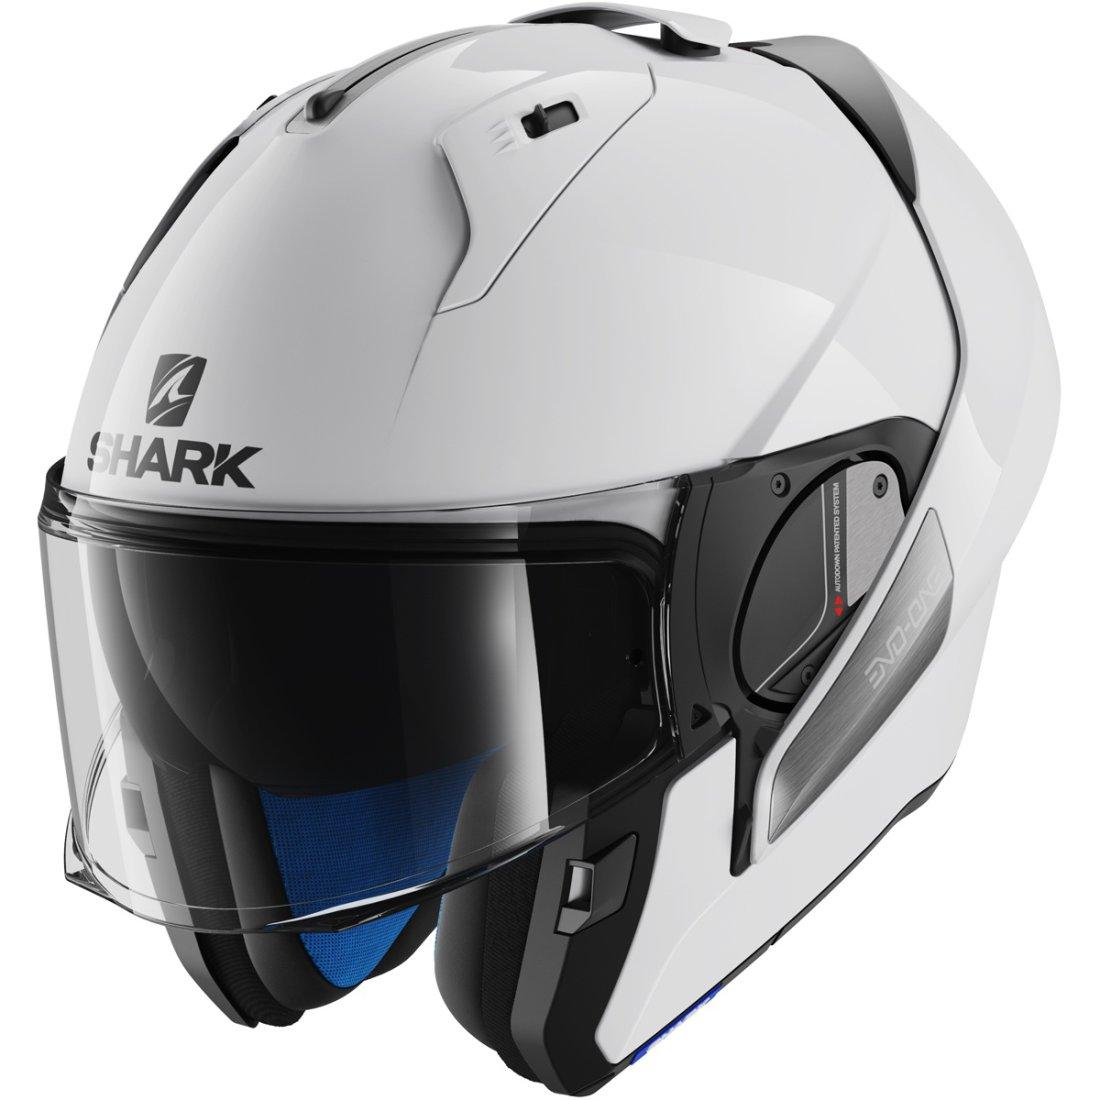 shark evo one blank white azur helmet motocard. Black Bedroom Furniture Sets. Home Design Ideas